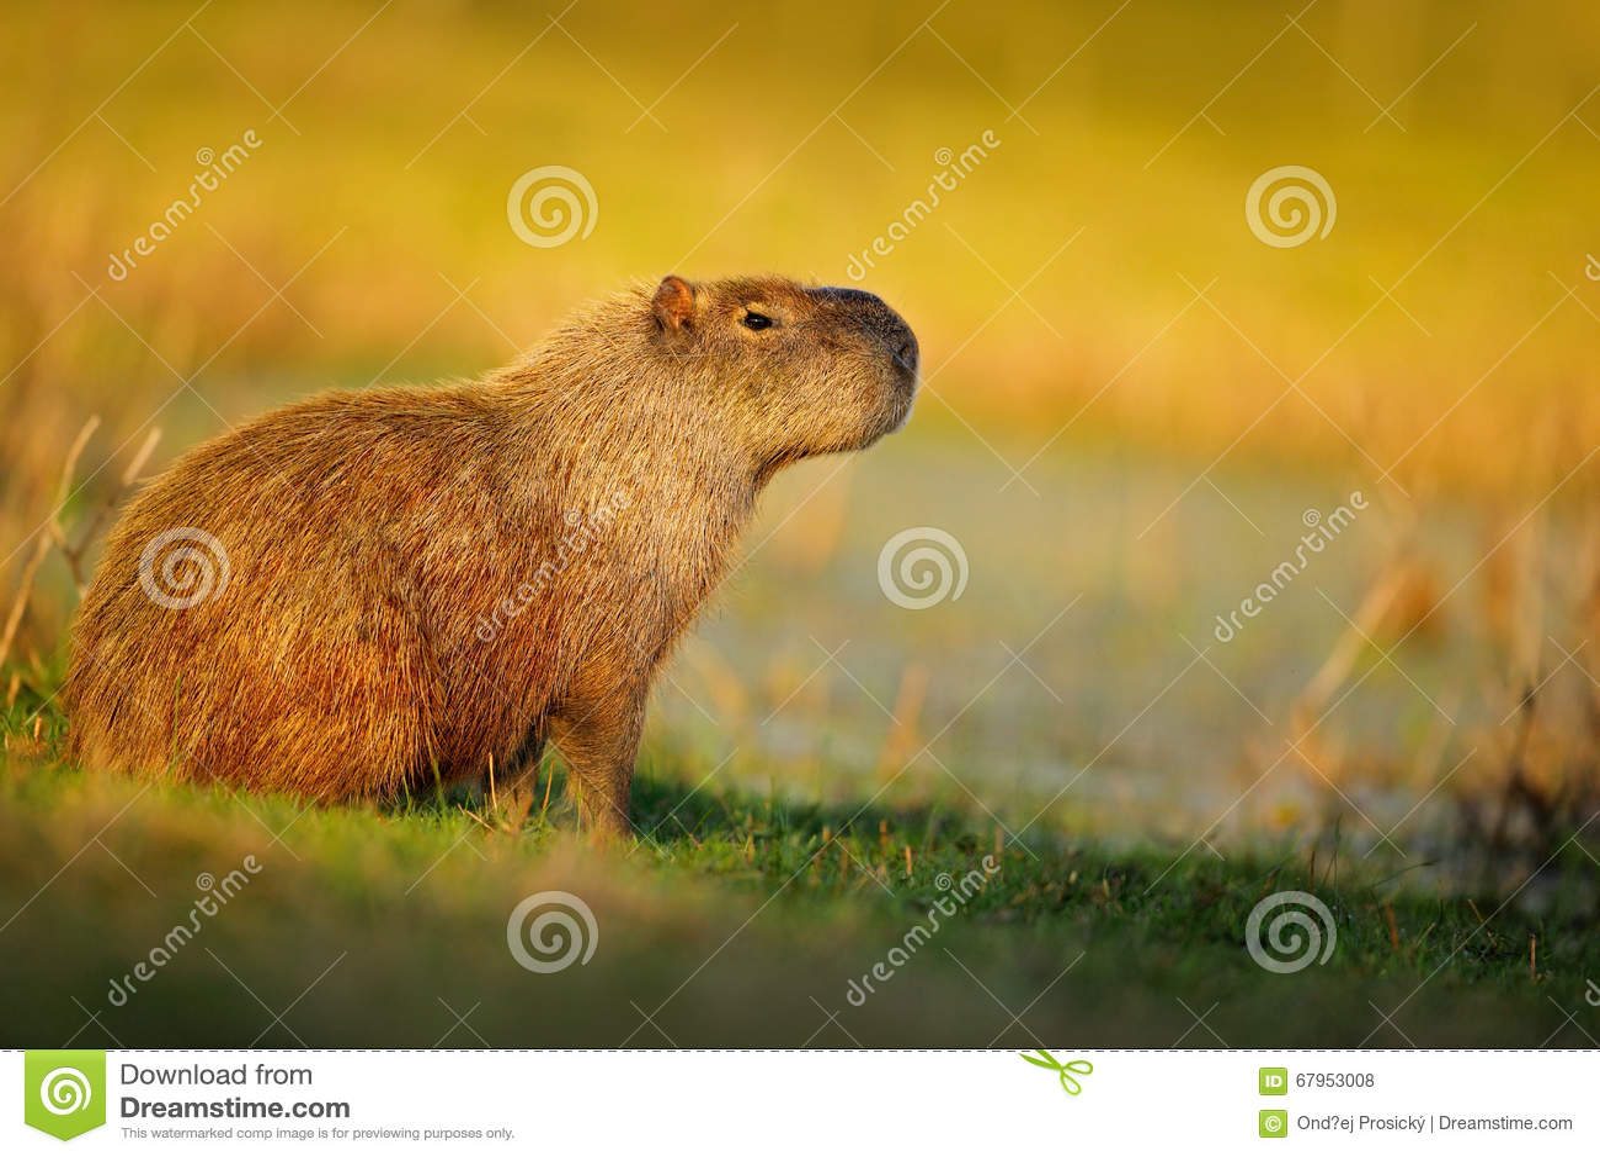 Biggest mouse, Capybara, Hydrochoerus hydrochaeris, with evening light during sunset, Pantanal, Brazil